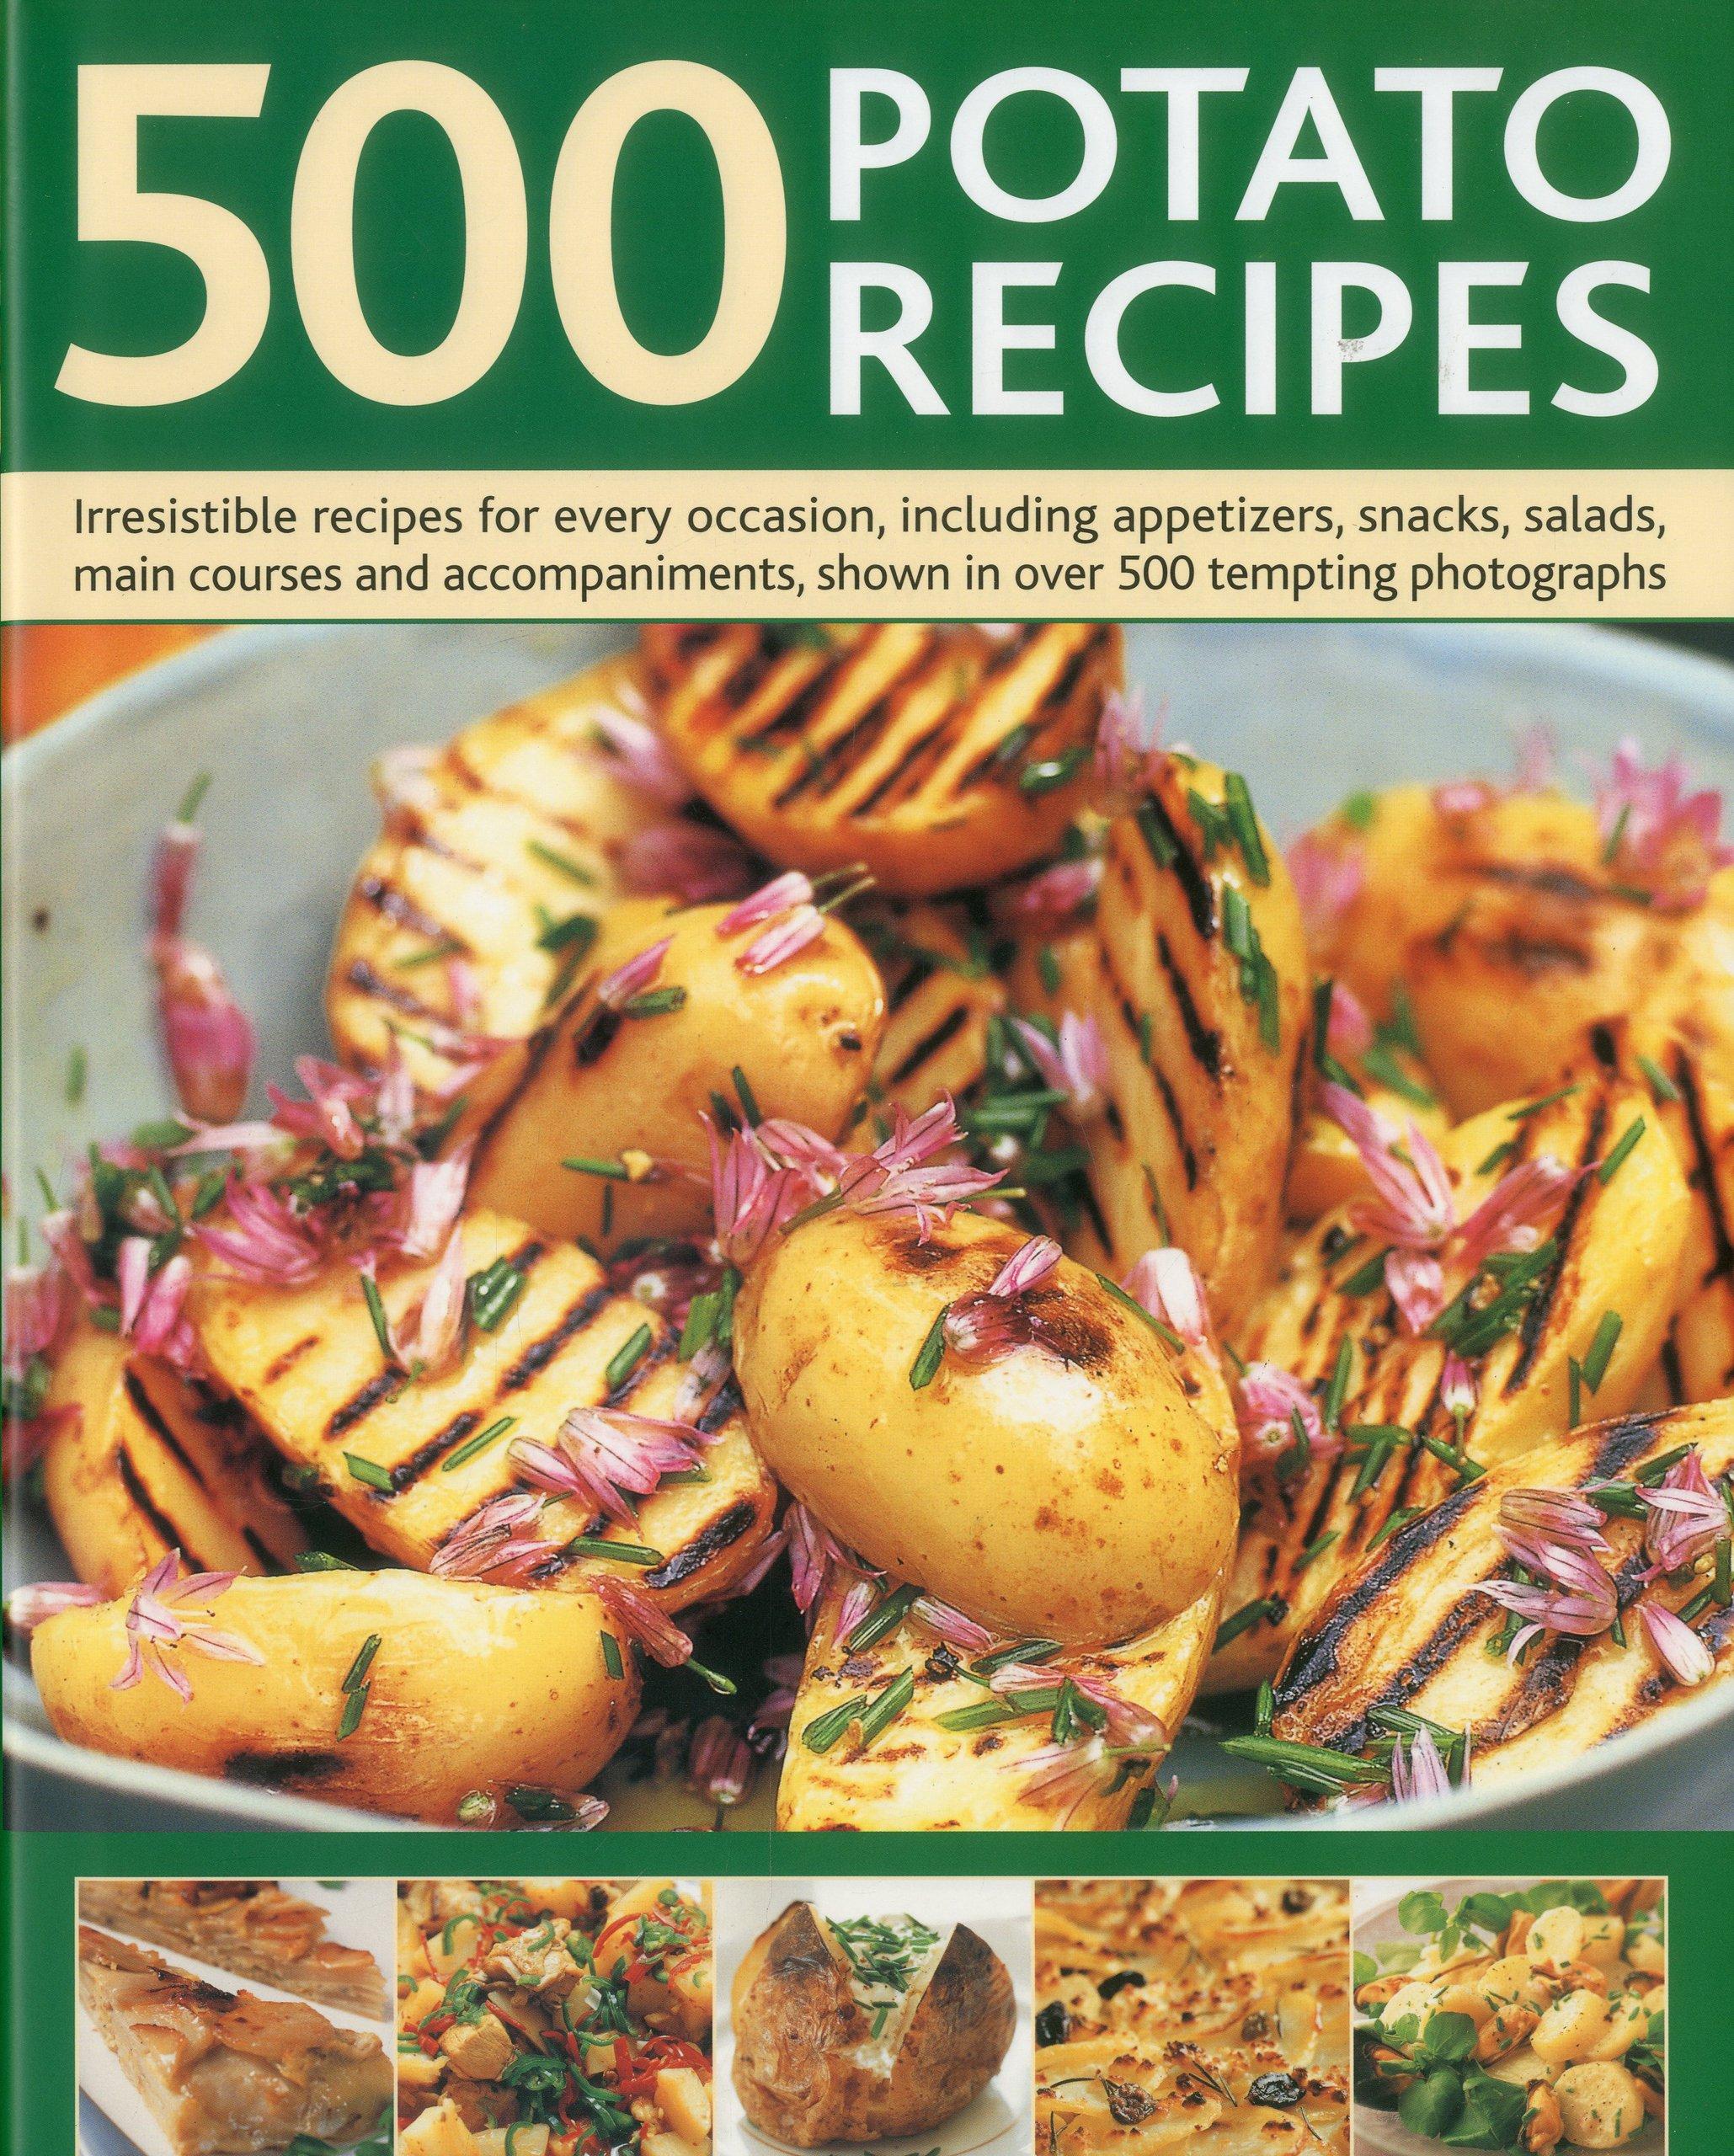 Wholesome Potatoes Cookbook